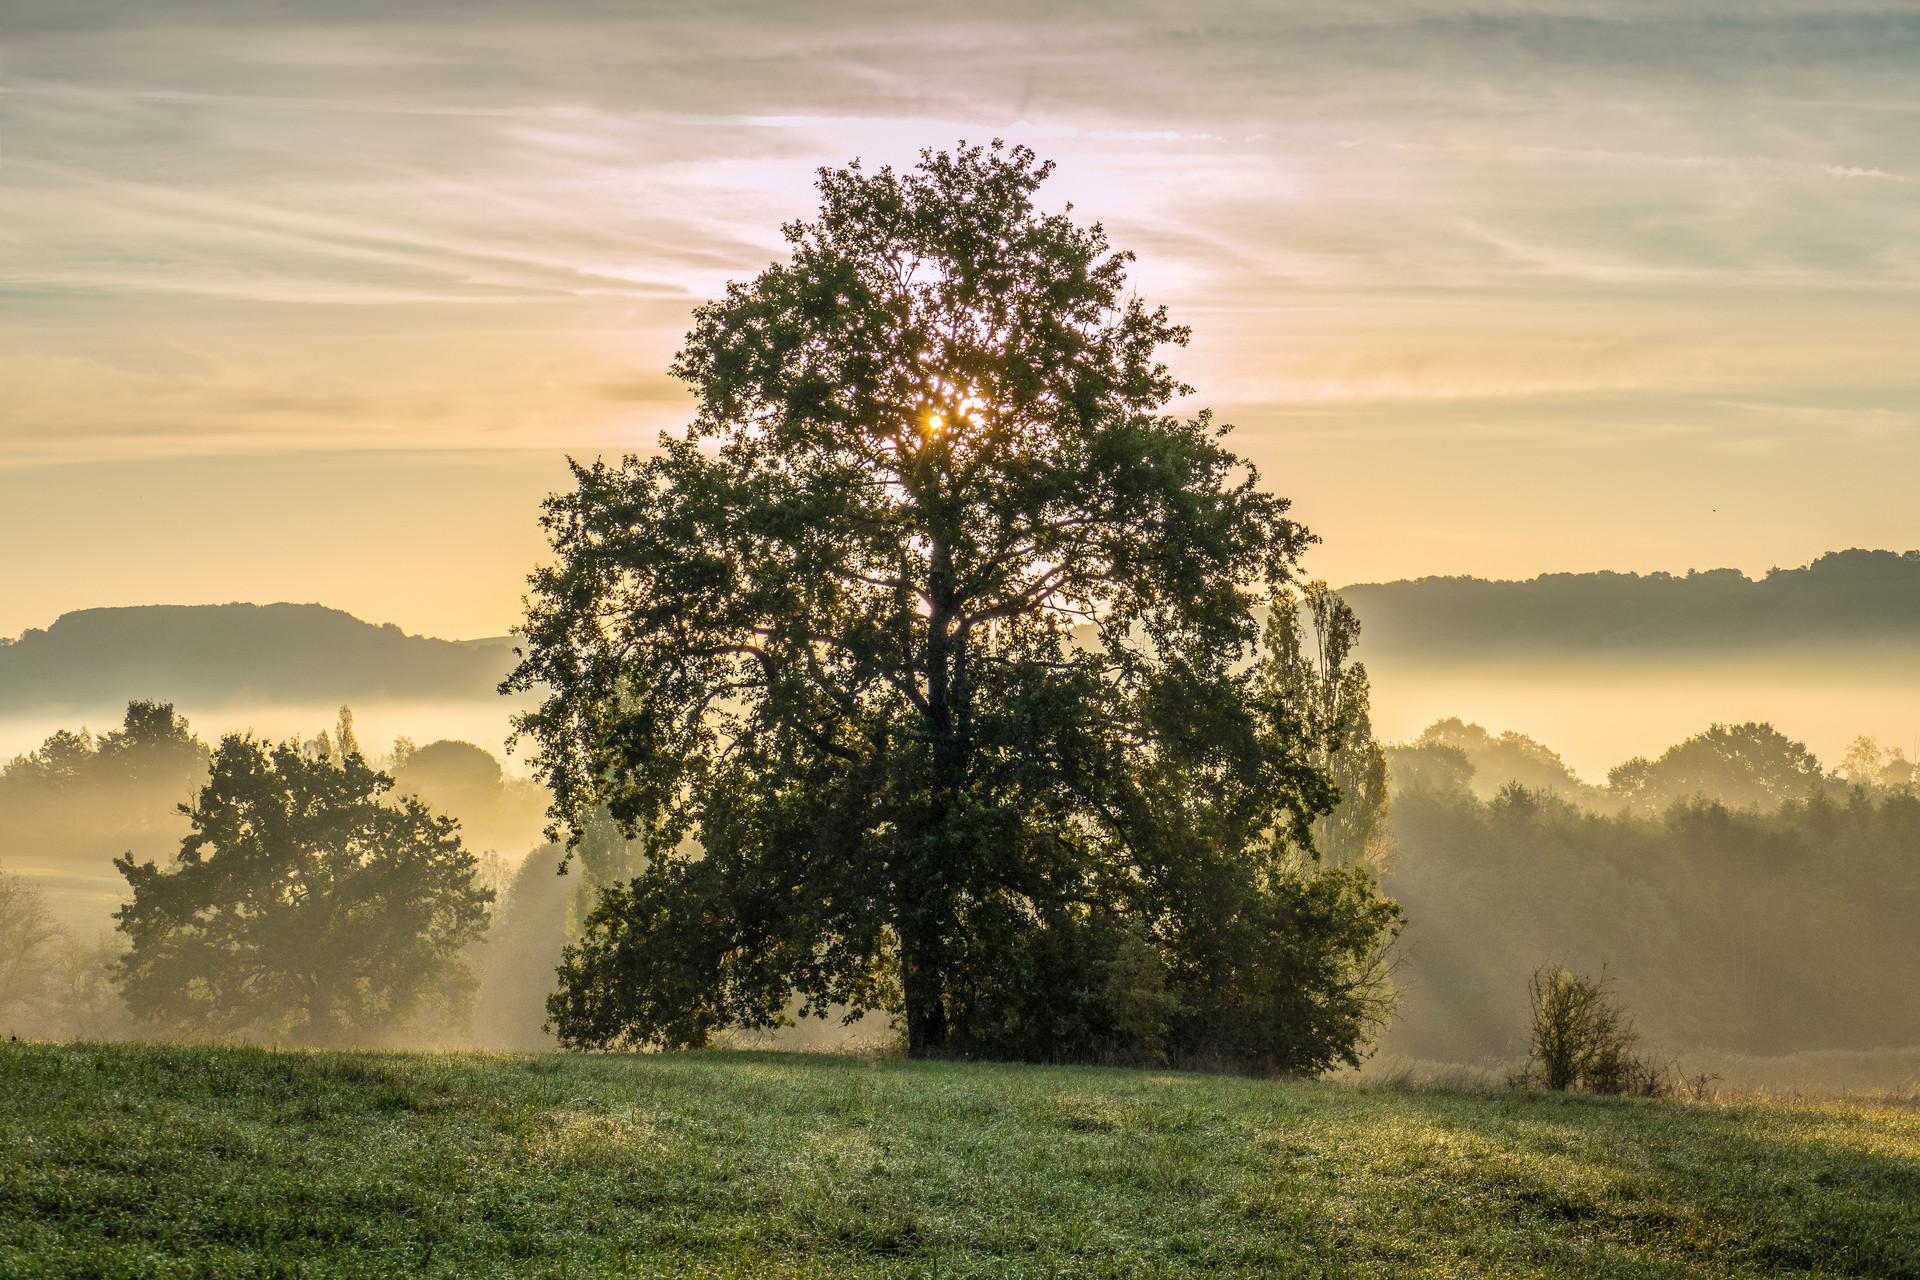 L'éveil, Tarn, France